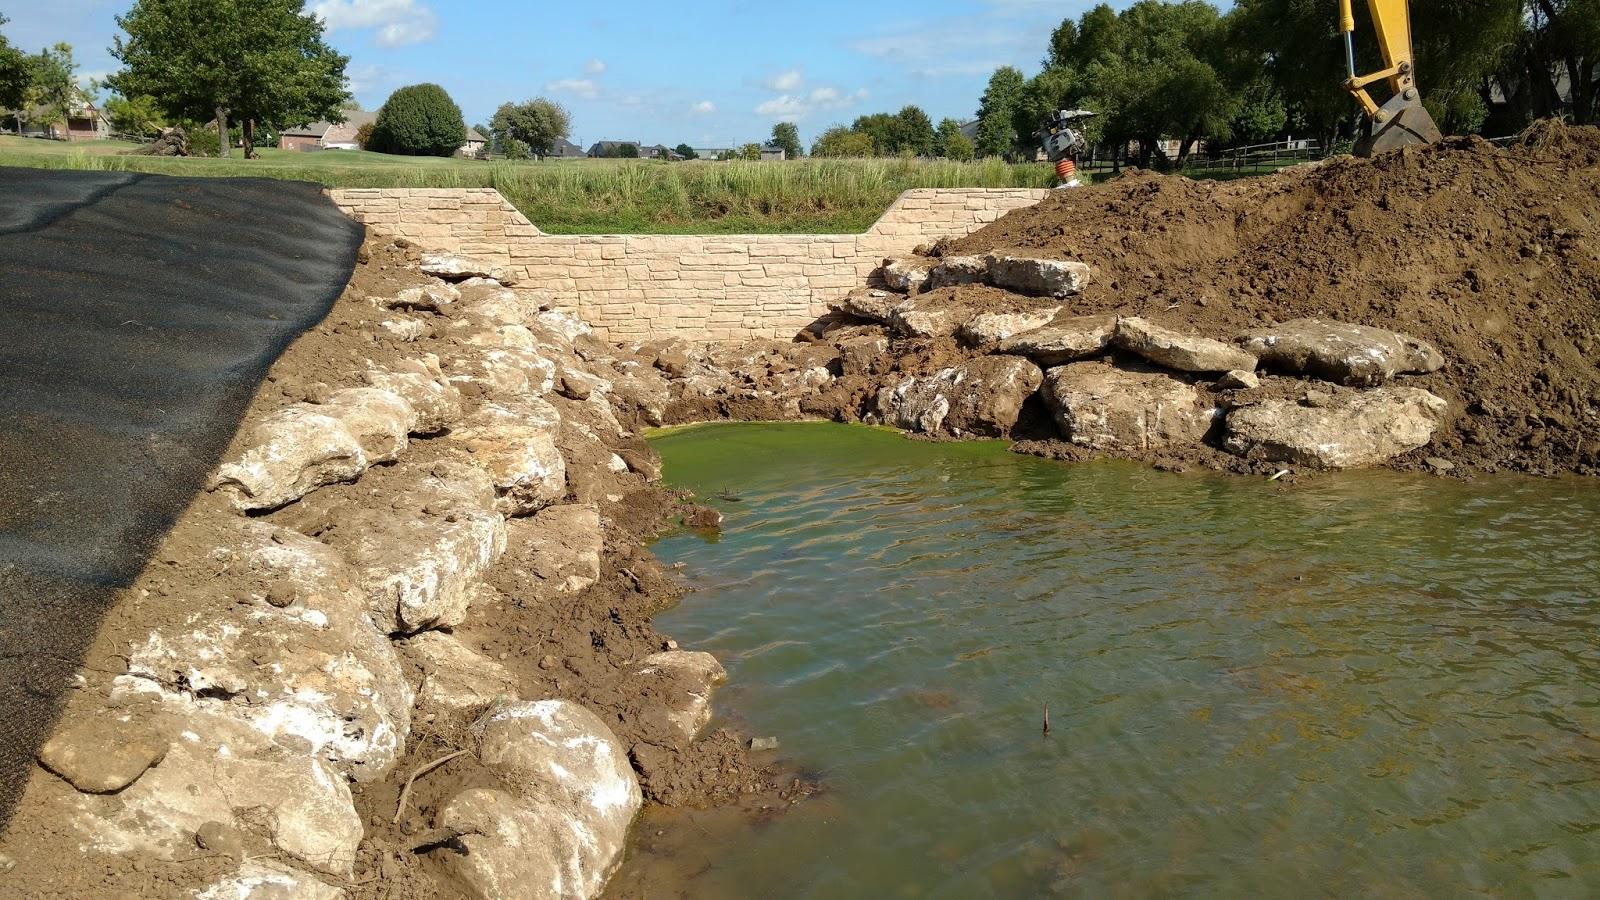 Grounds department blog 3 pond dam construction complete for Pond dam design